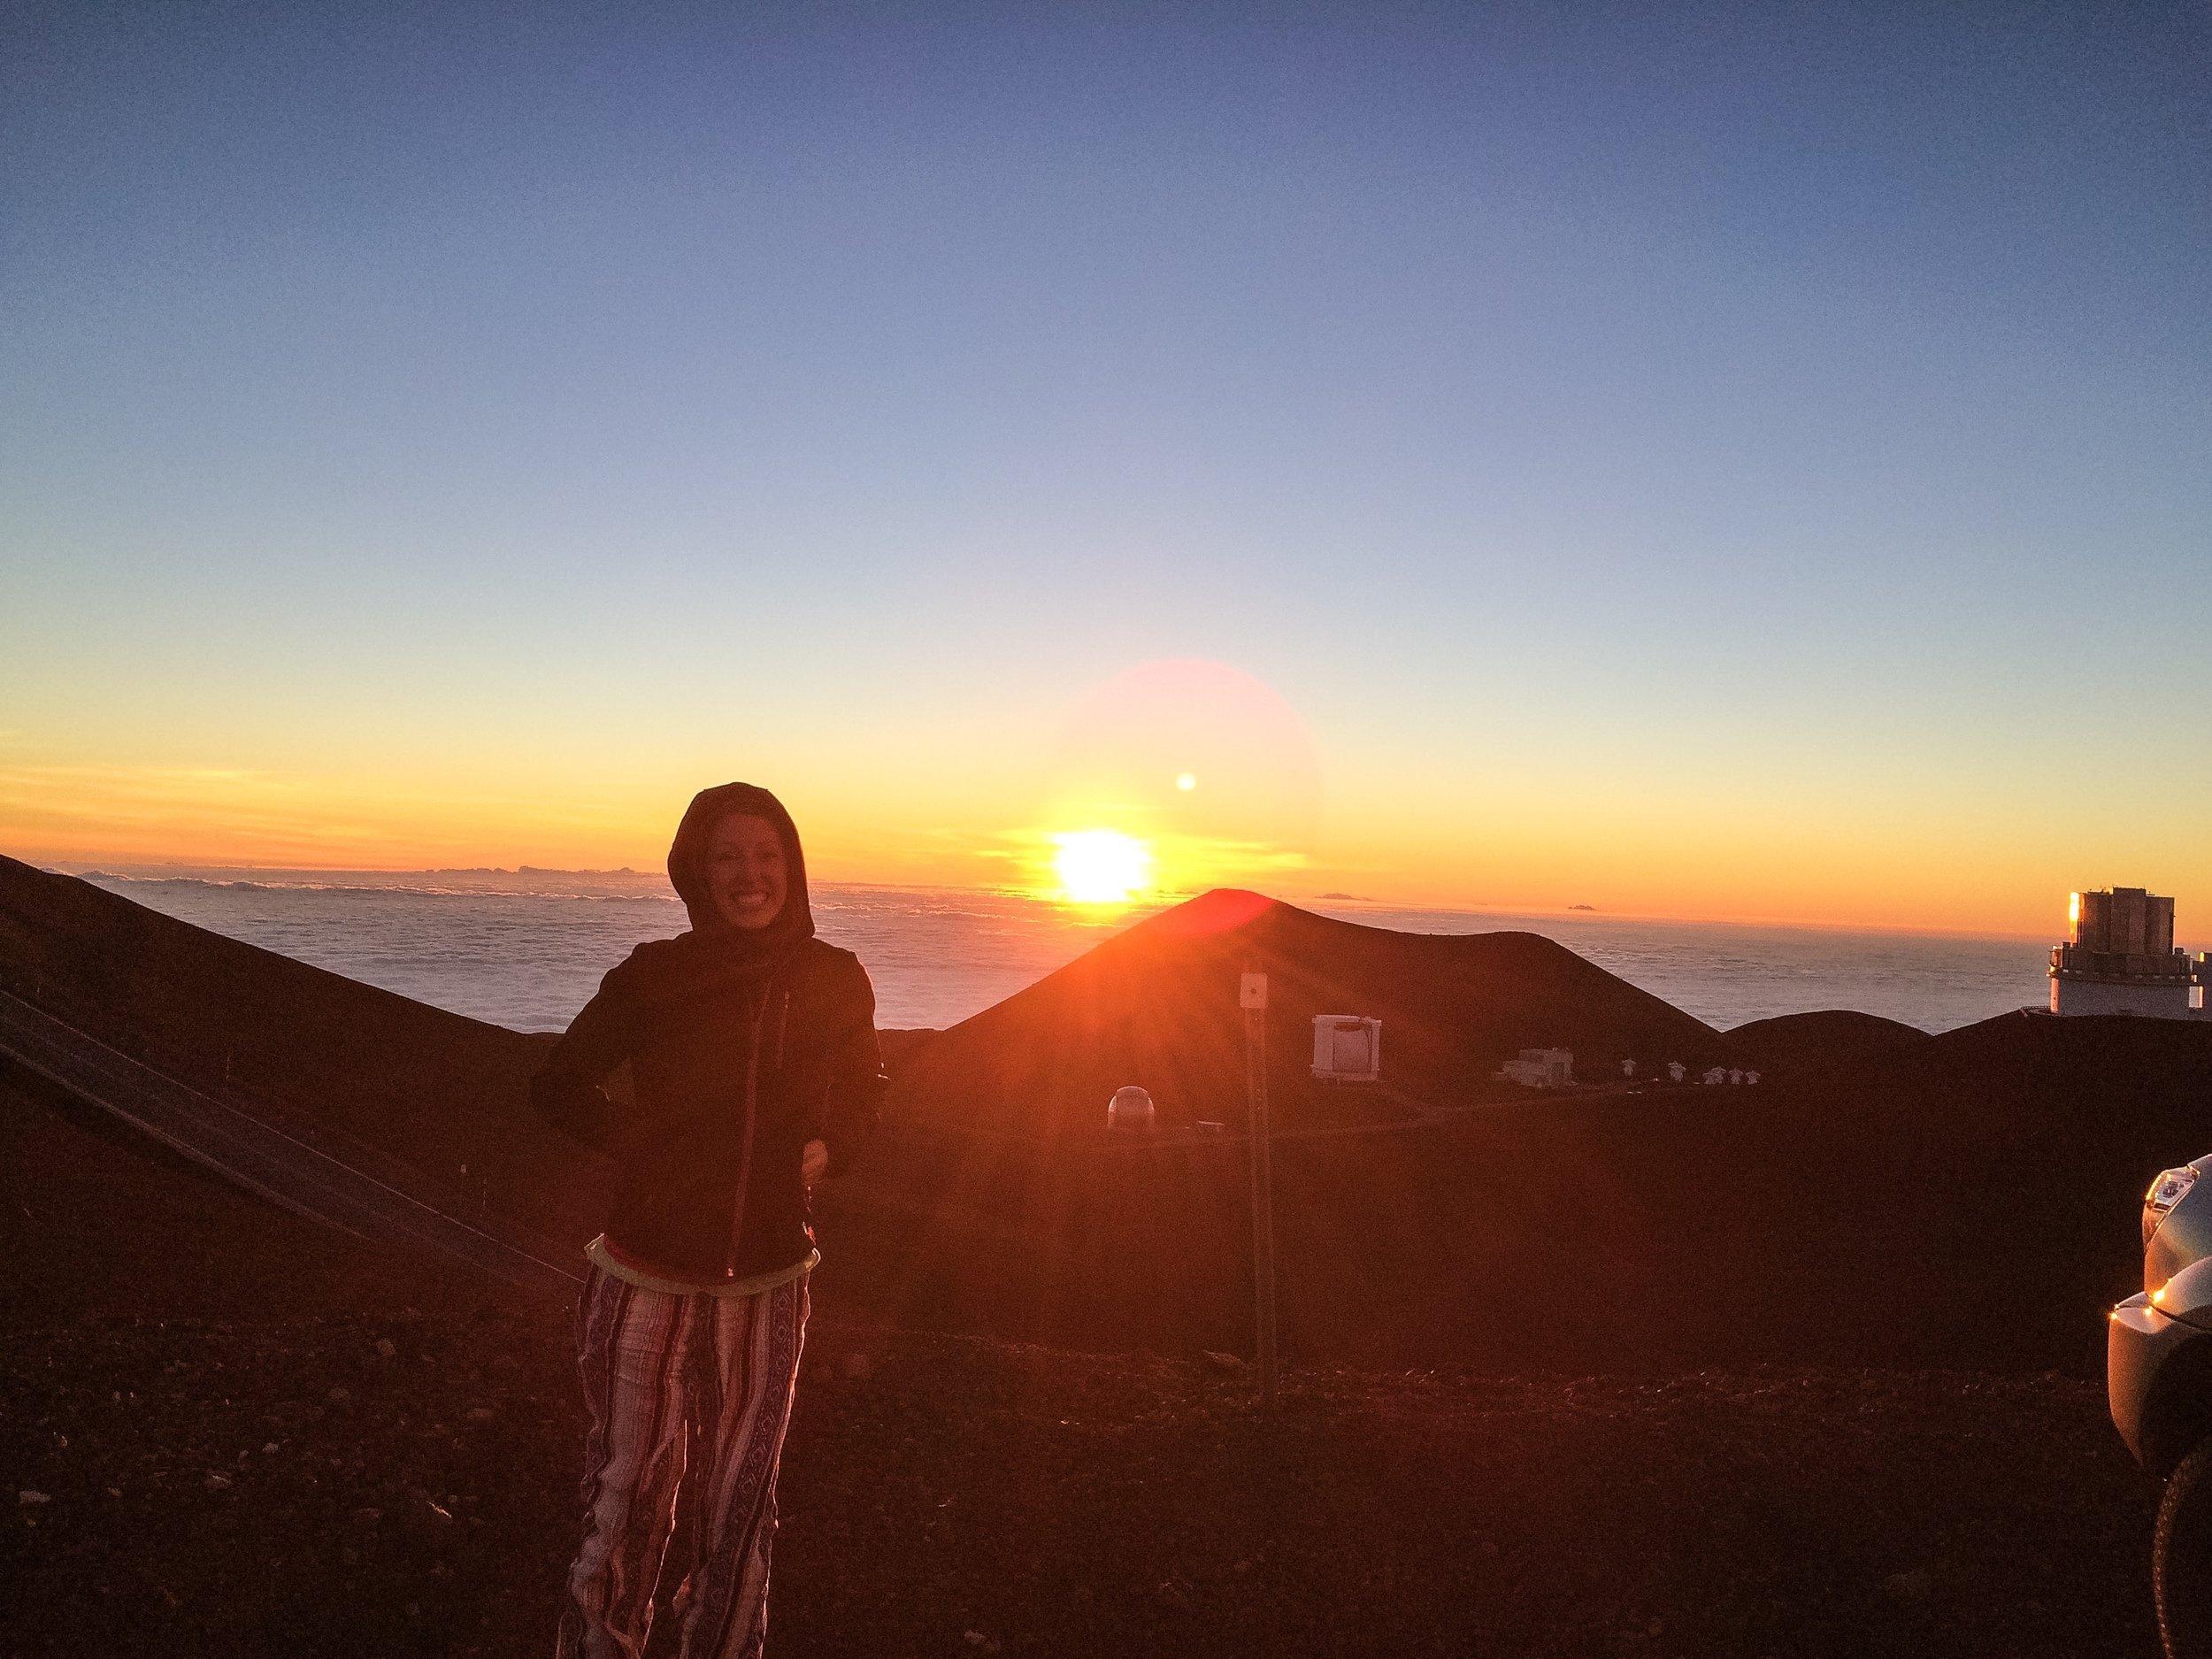 Sunset at 14,000 feet atop Mauna Kea in Hawaii